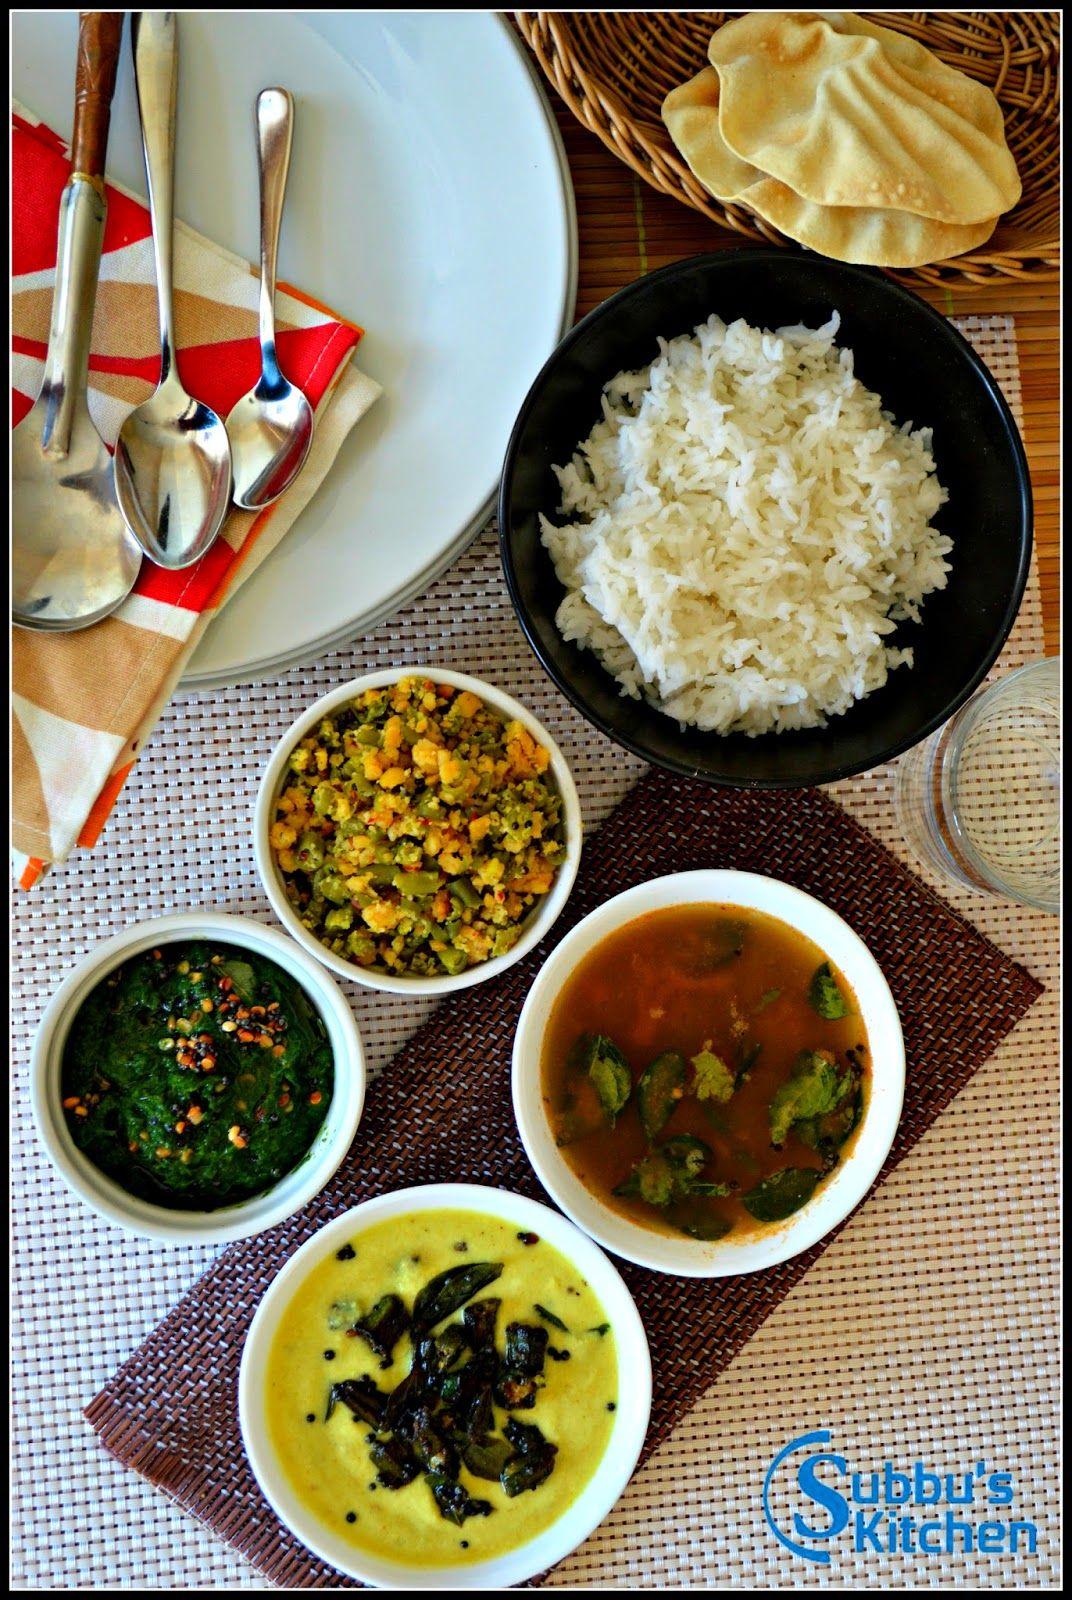 Subbus Kitchen South Indian Lunch Menu 2 Mor Kuzhambu Kalyana Rasam Paruppu Usuli And Keerai Masi Indian Food Recipes Indian Cooking Vegan Recipes Healthy